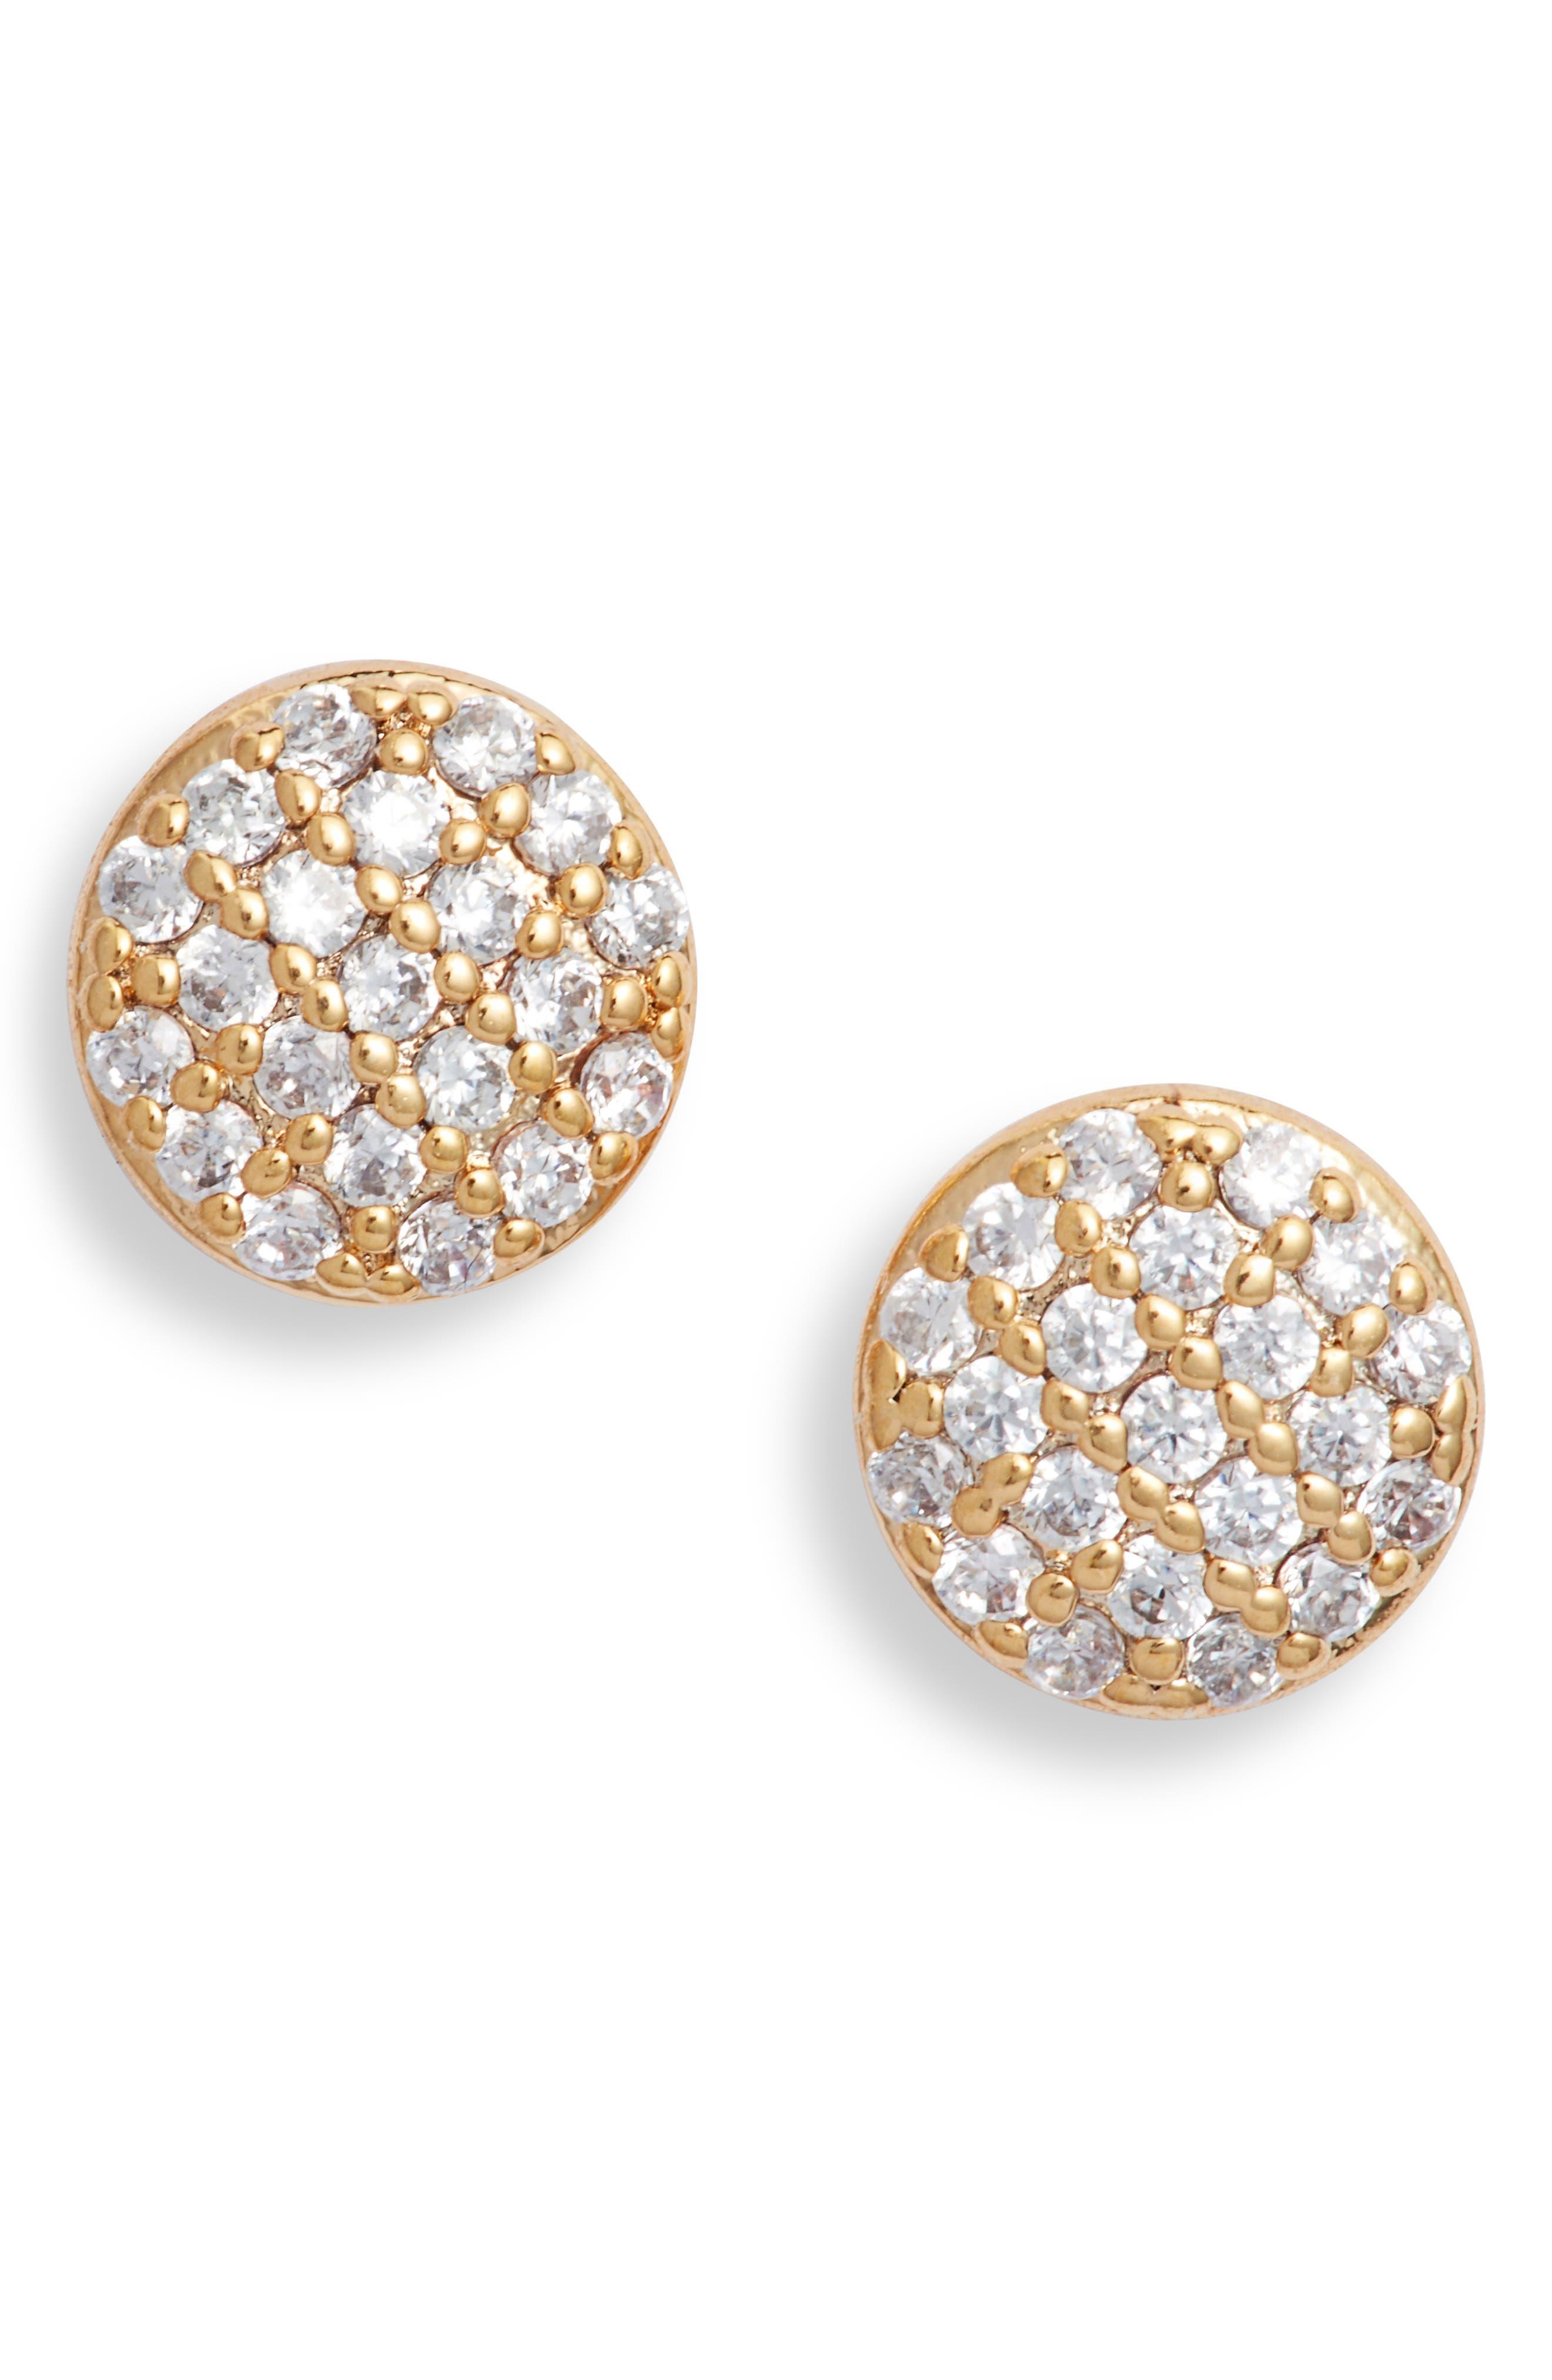 Pave Disc Stud Earrings